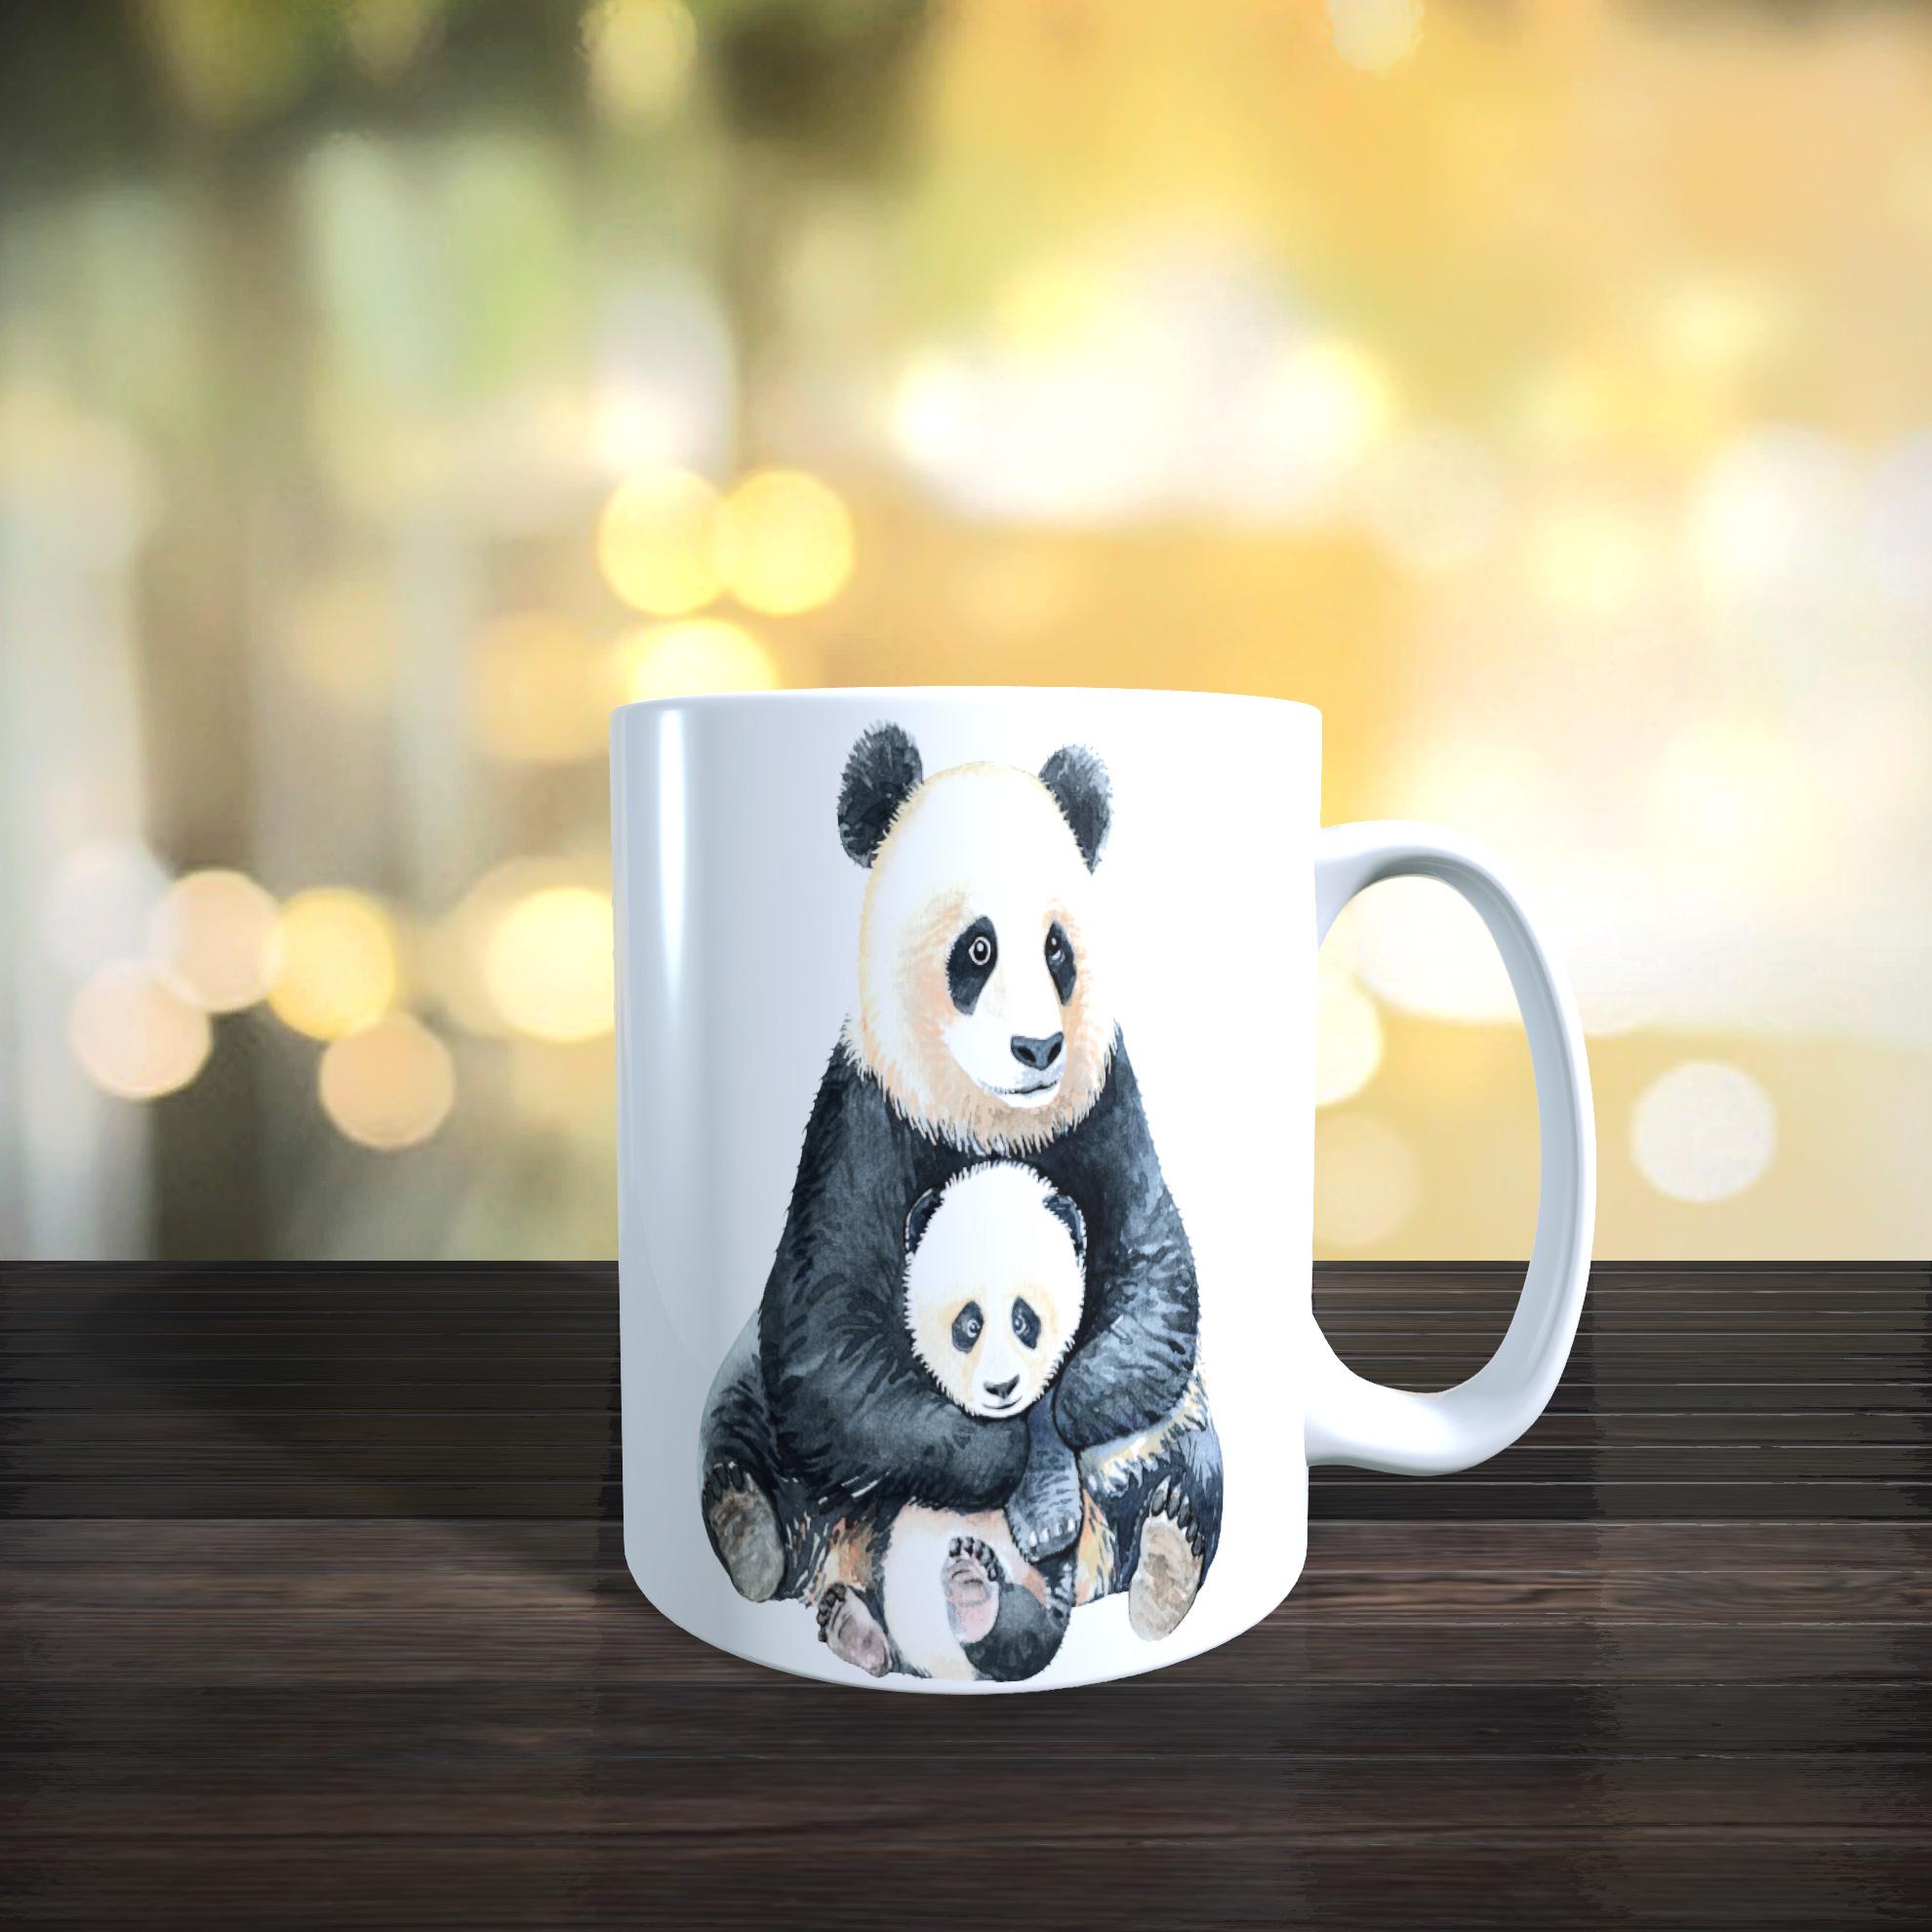 Cute Mother and Baby Panda 11oz Ceramic Mothers Day / Birthday Gift Mug.